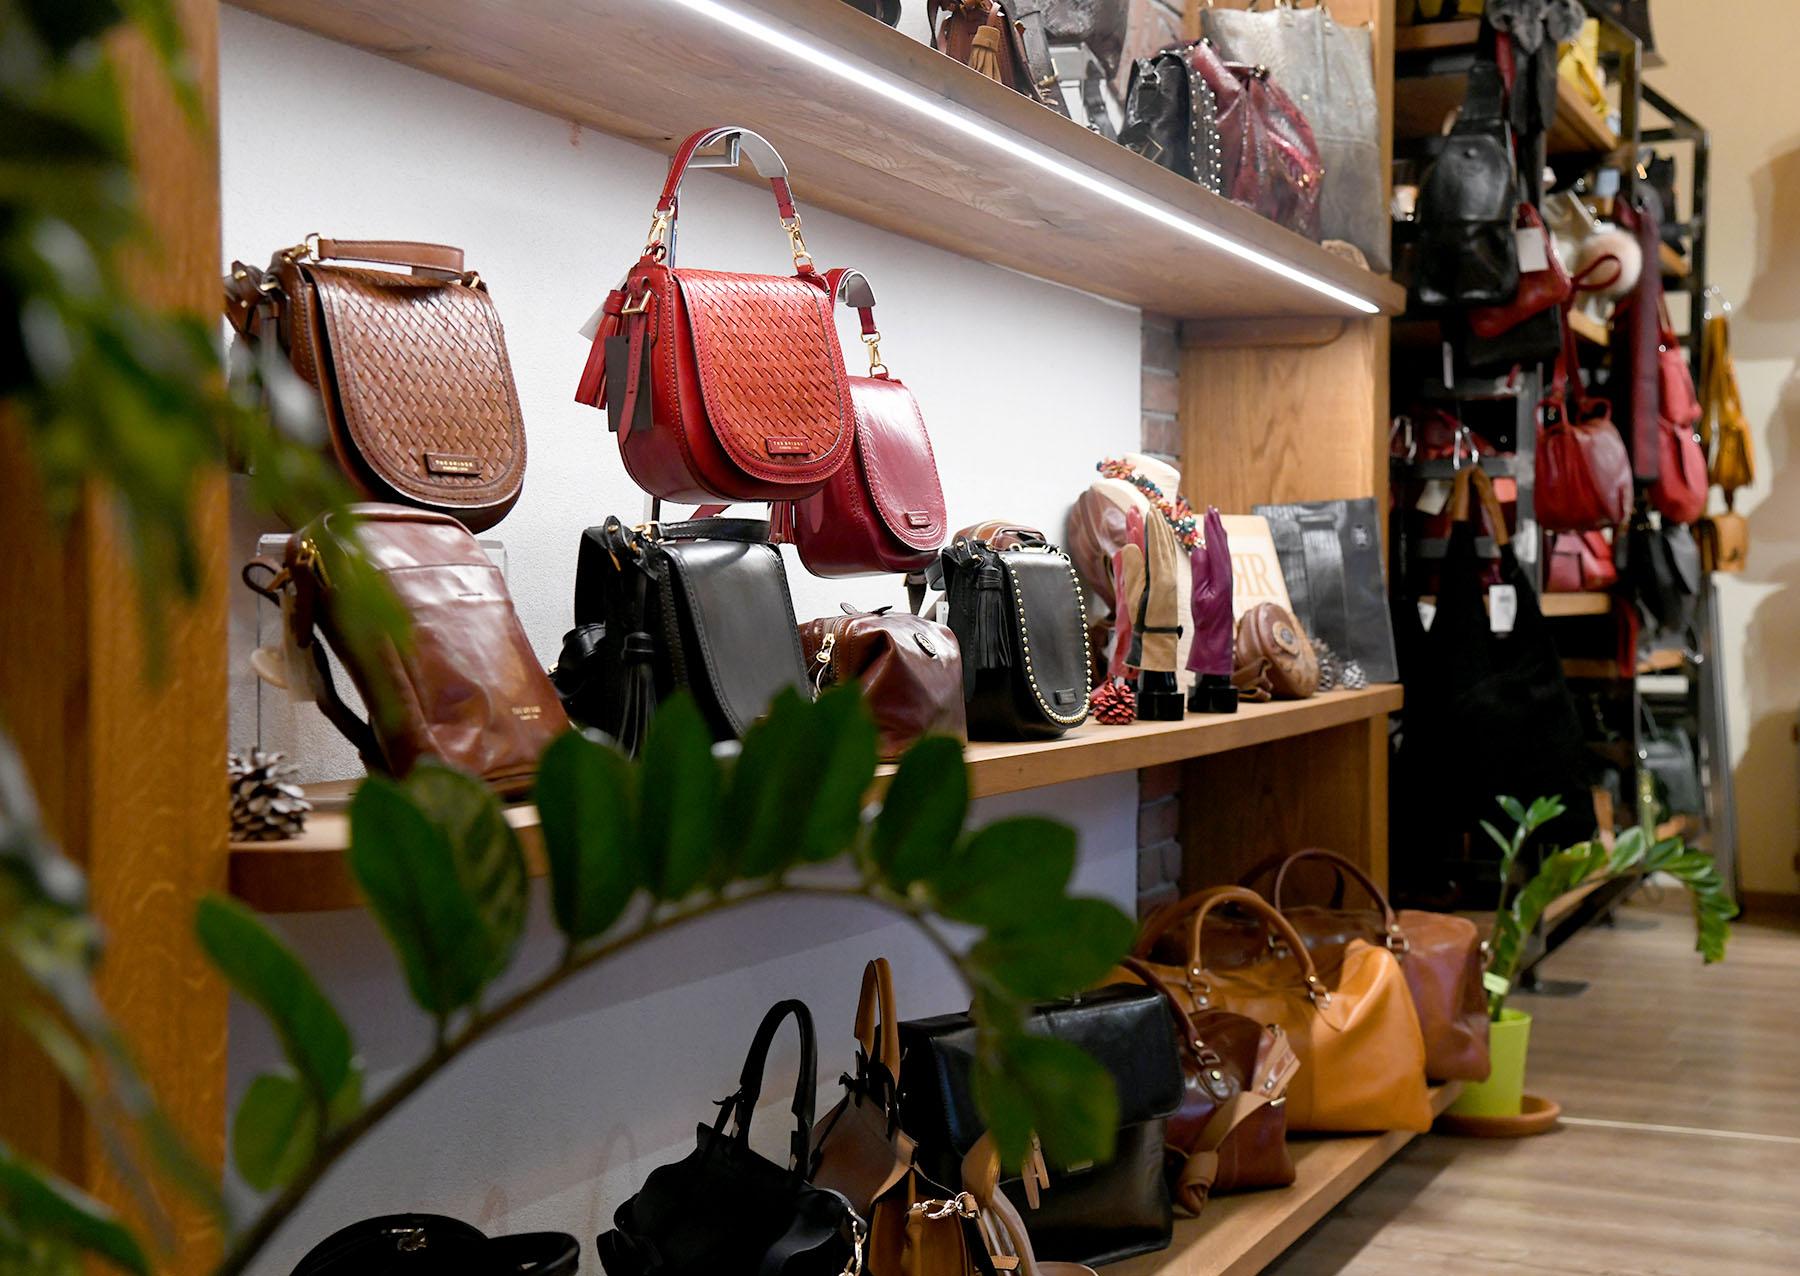 Extravagant shopping: Borša, savršena adresa za savršen blagdanski šoping